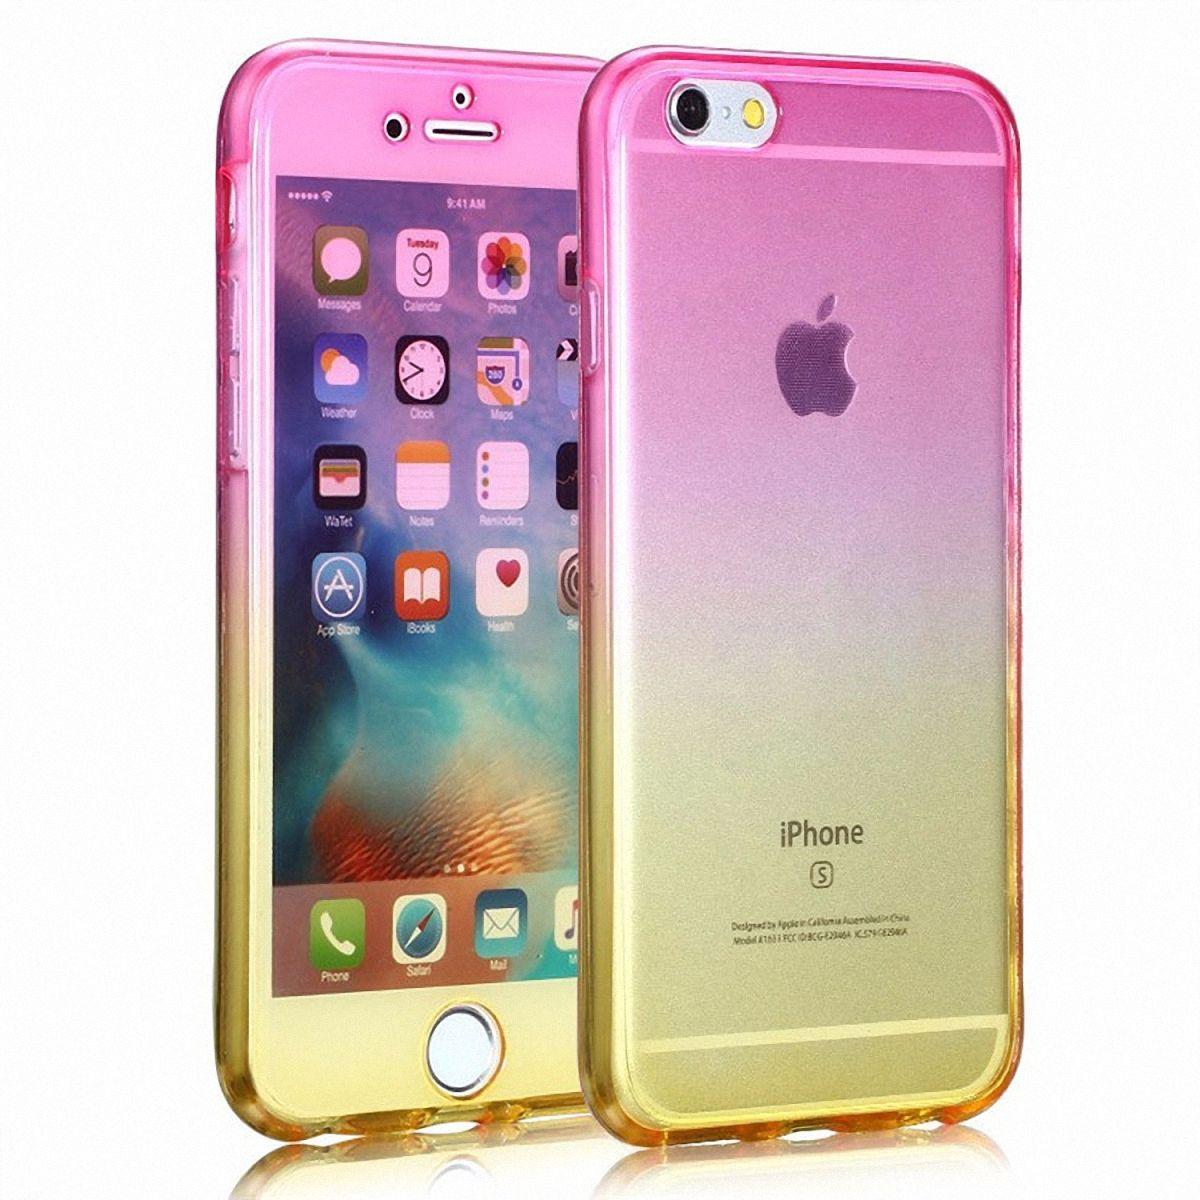 Crystal Case Hülle für Apple iPhone 8 Plus Pink Gelb Rahmen Full Body